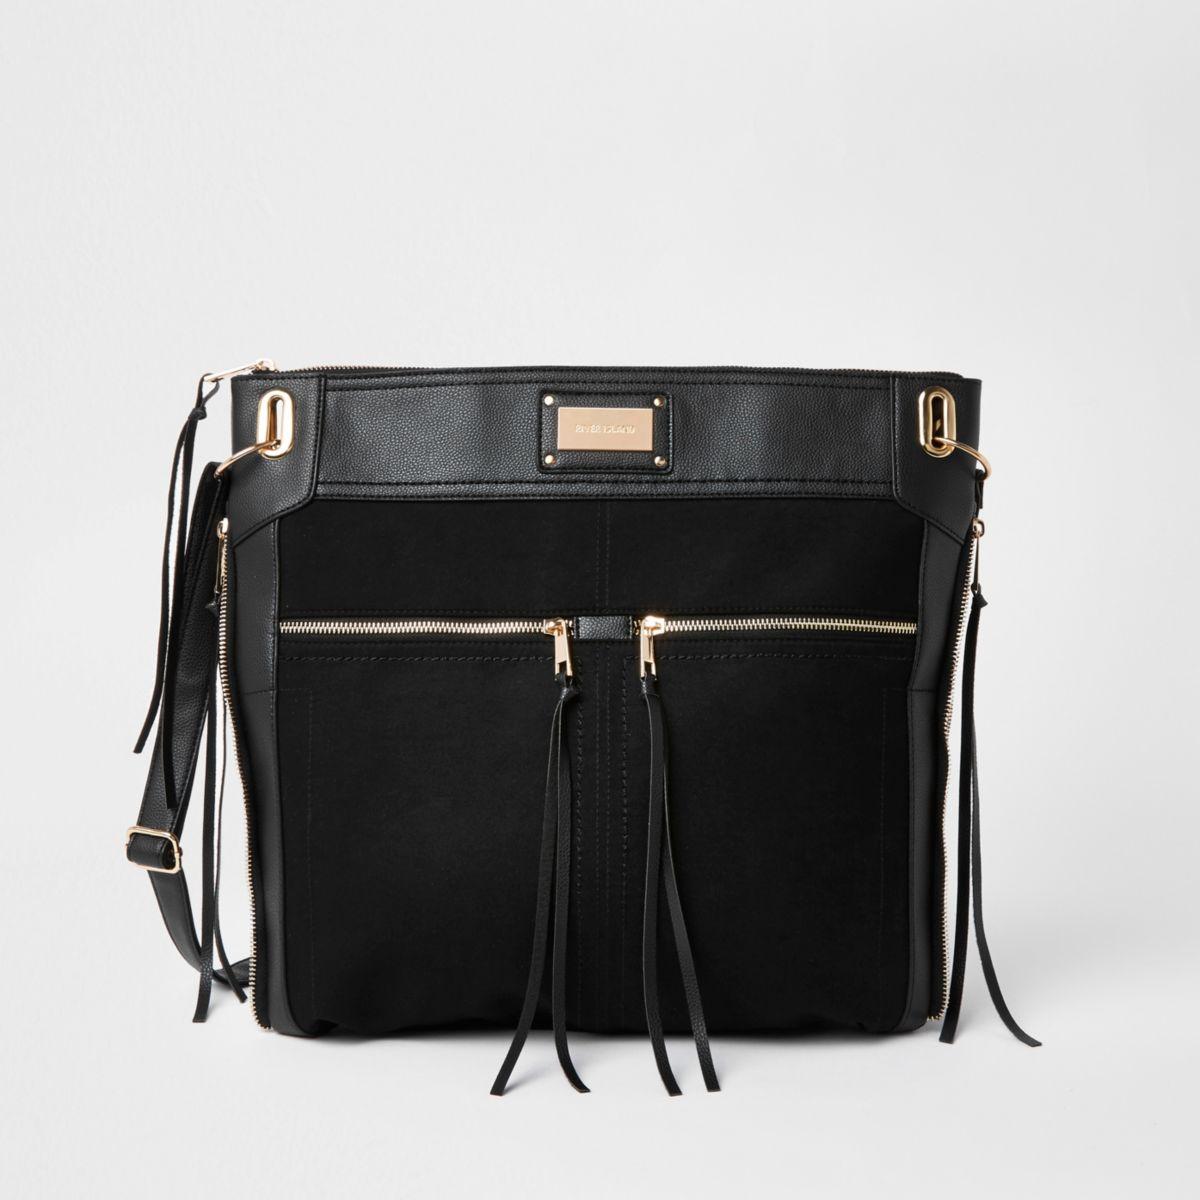 Black oversized messenger bag